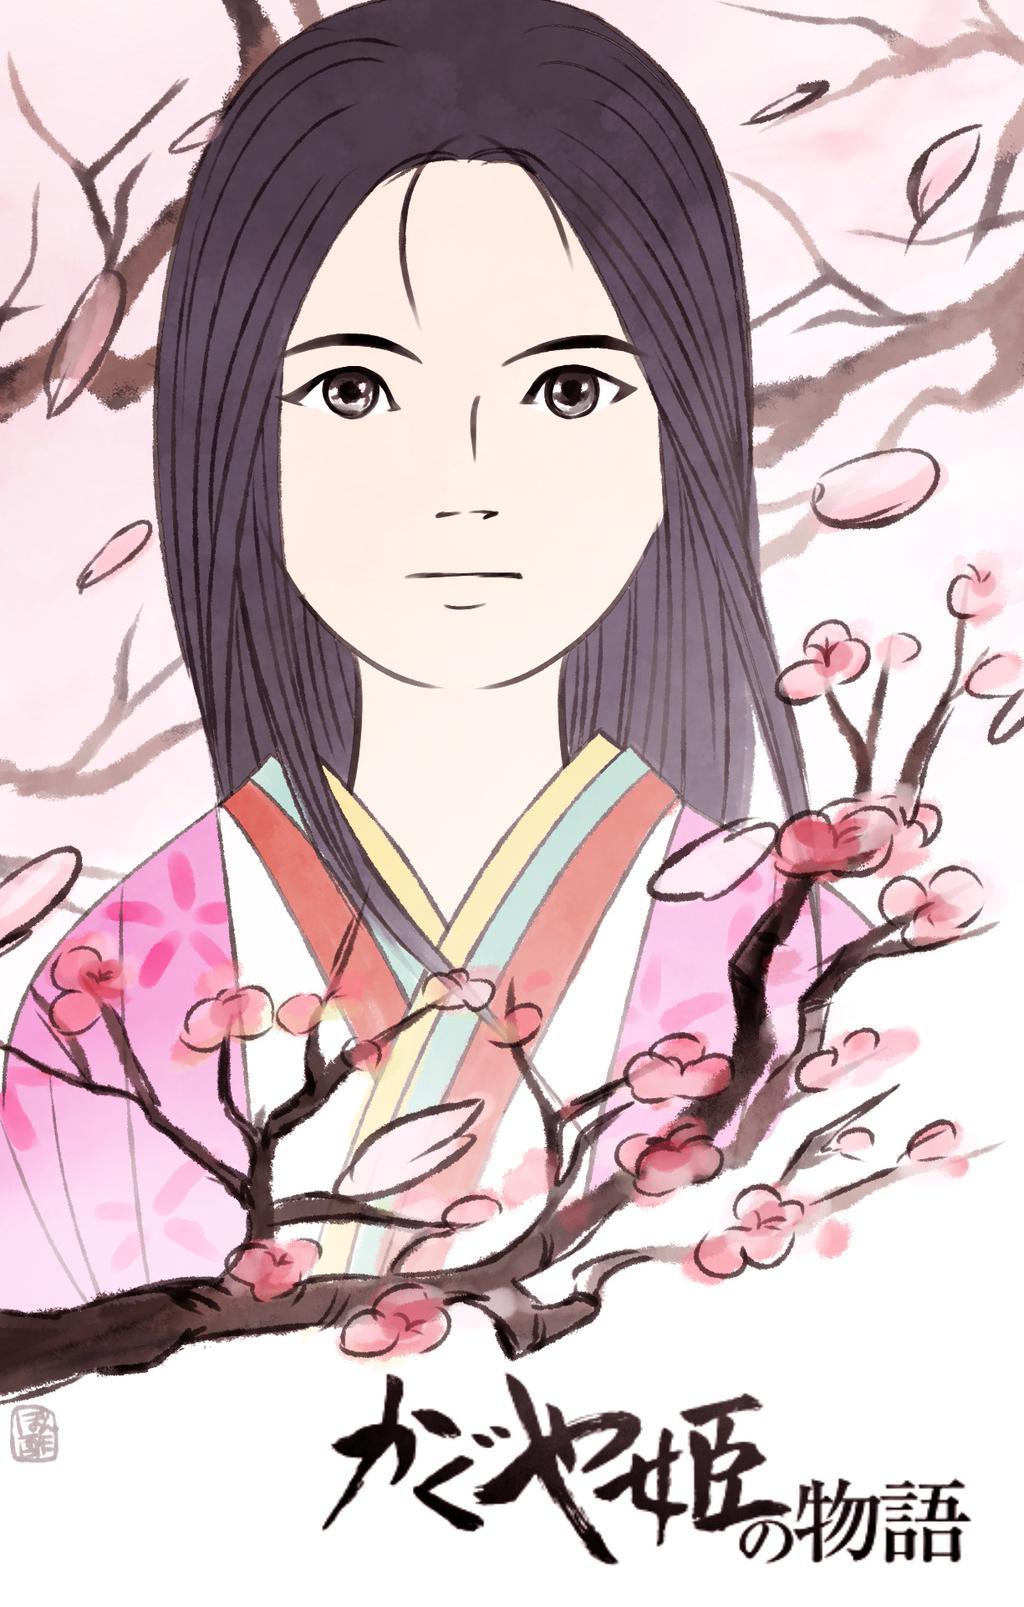 Princess Kaguya Studio Ghibli Fan Art 38374391 Fanpop